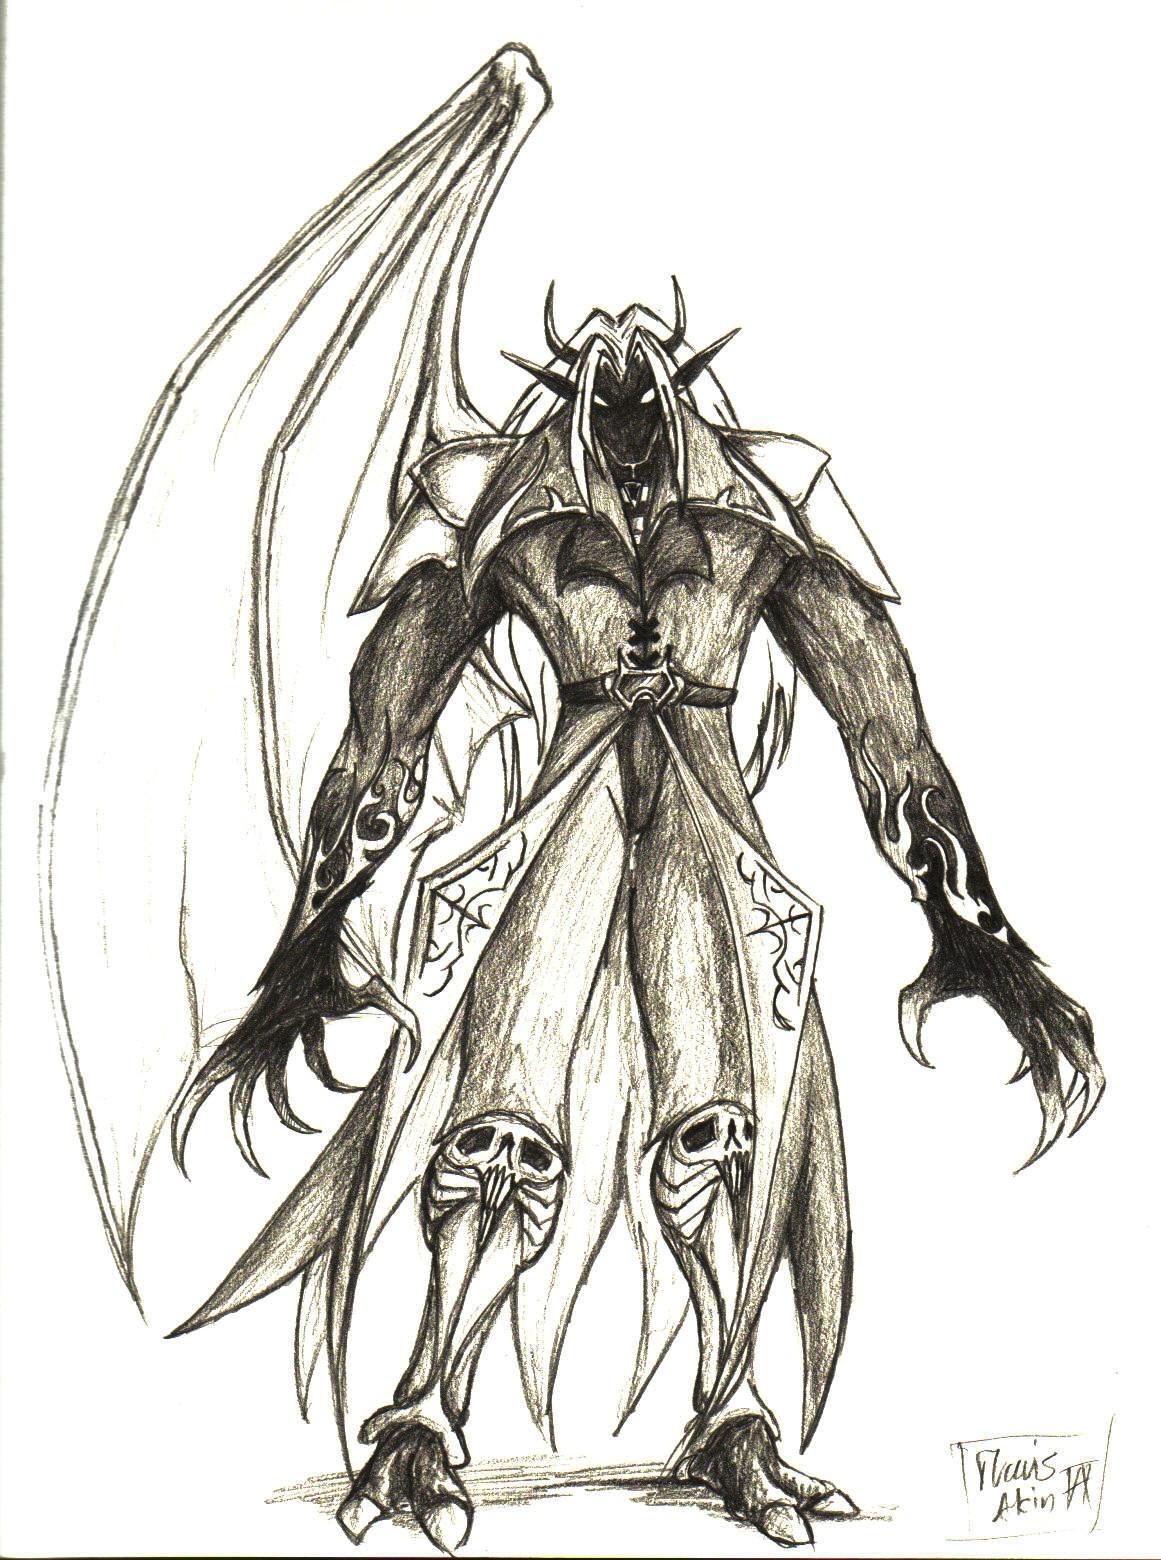 Demon Sephiroth by CurseReaper - 552.2KB